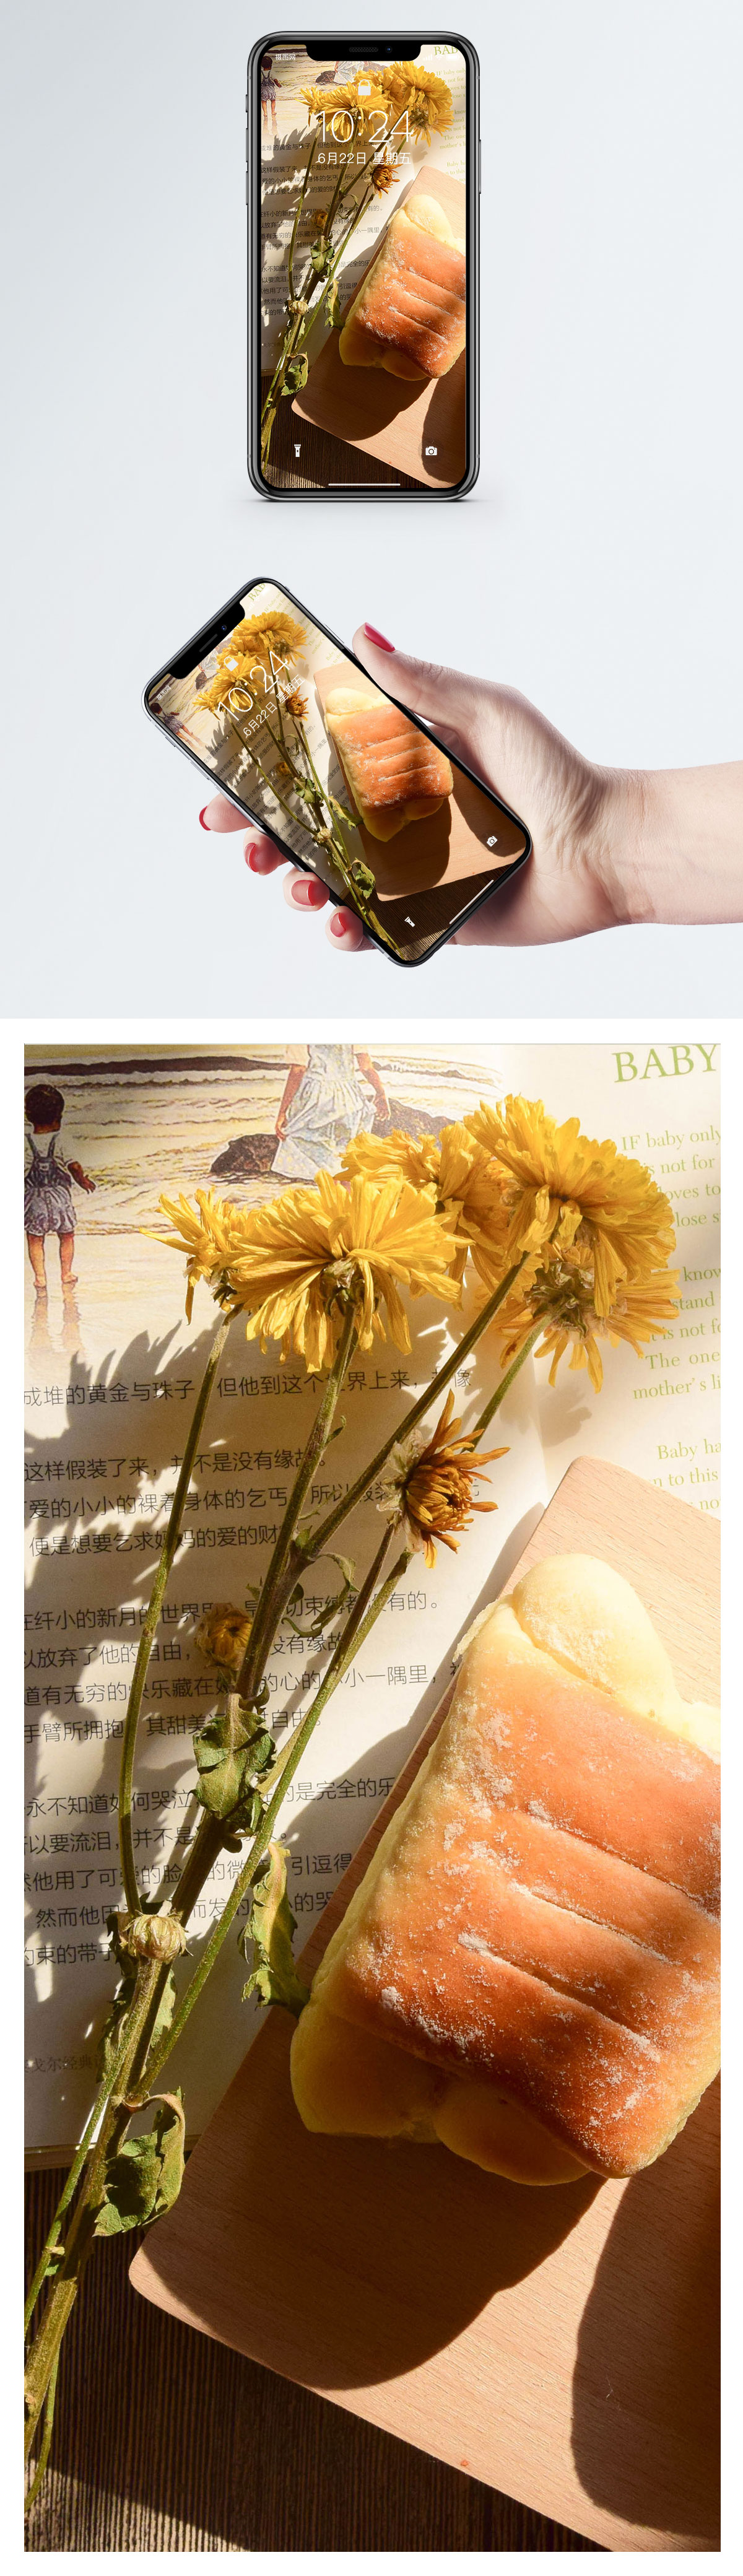 Afternoon Tea Mobile Phone Wallpaper Backgrounds Images Free Download Lovepik Com